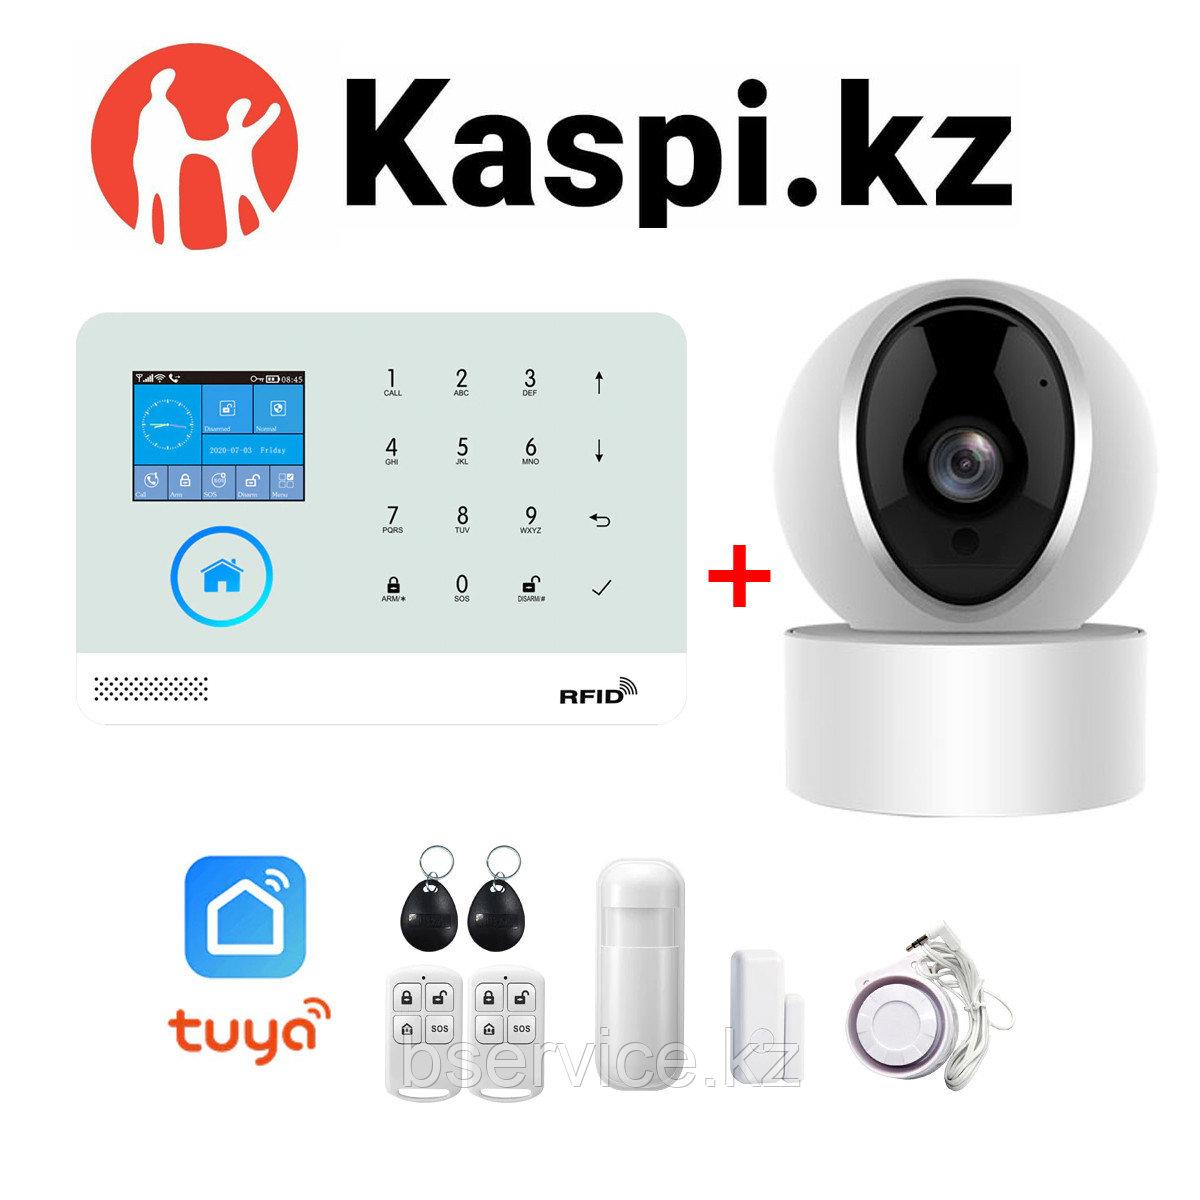 Комплект Цитадель GSM & WiFi Smart Kit 2